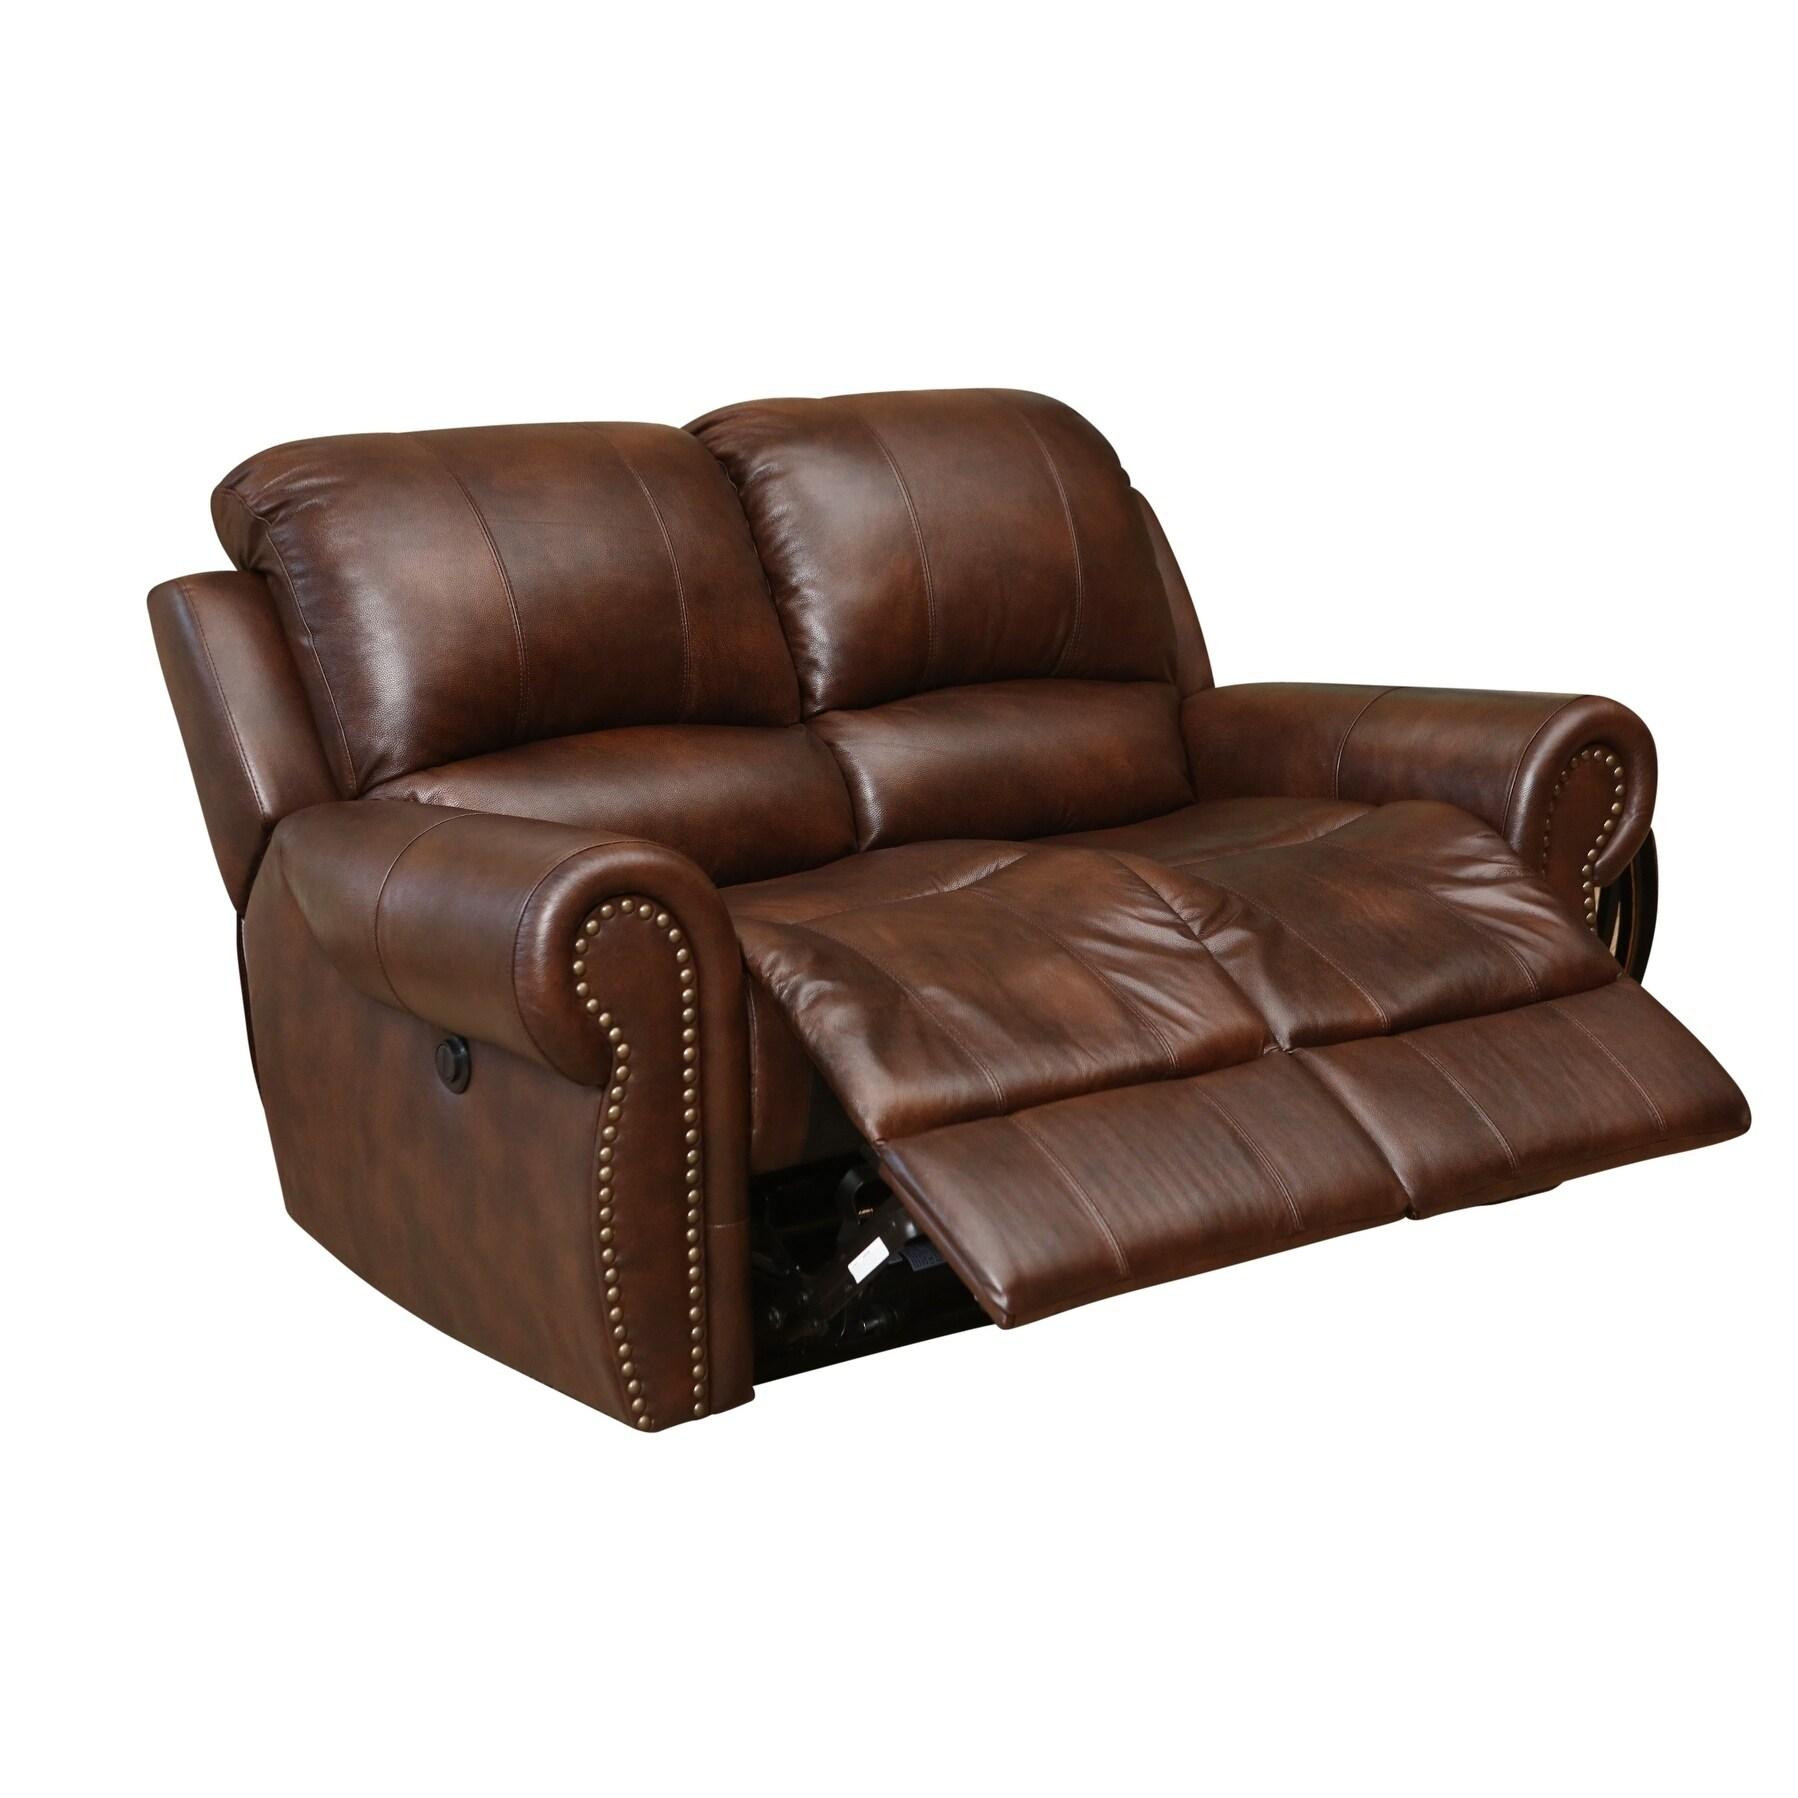 Fabulous Abbyson Sterling Top Grain Leather Power Reclining Loveseat Inzonedesignstudio Interior Chair Design Inzonedesignstudiocom